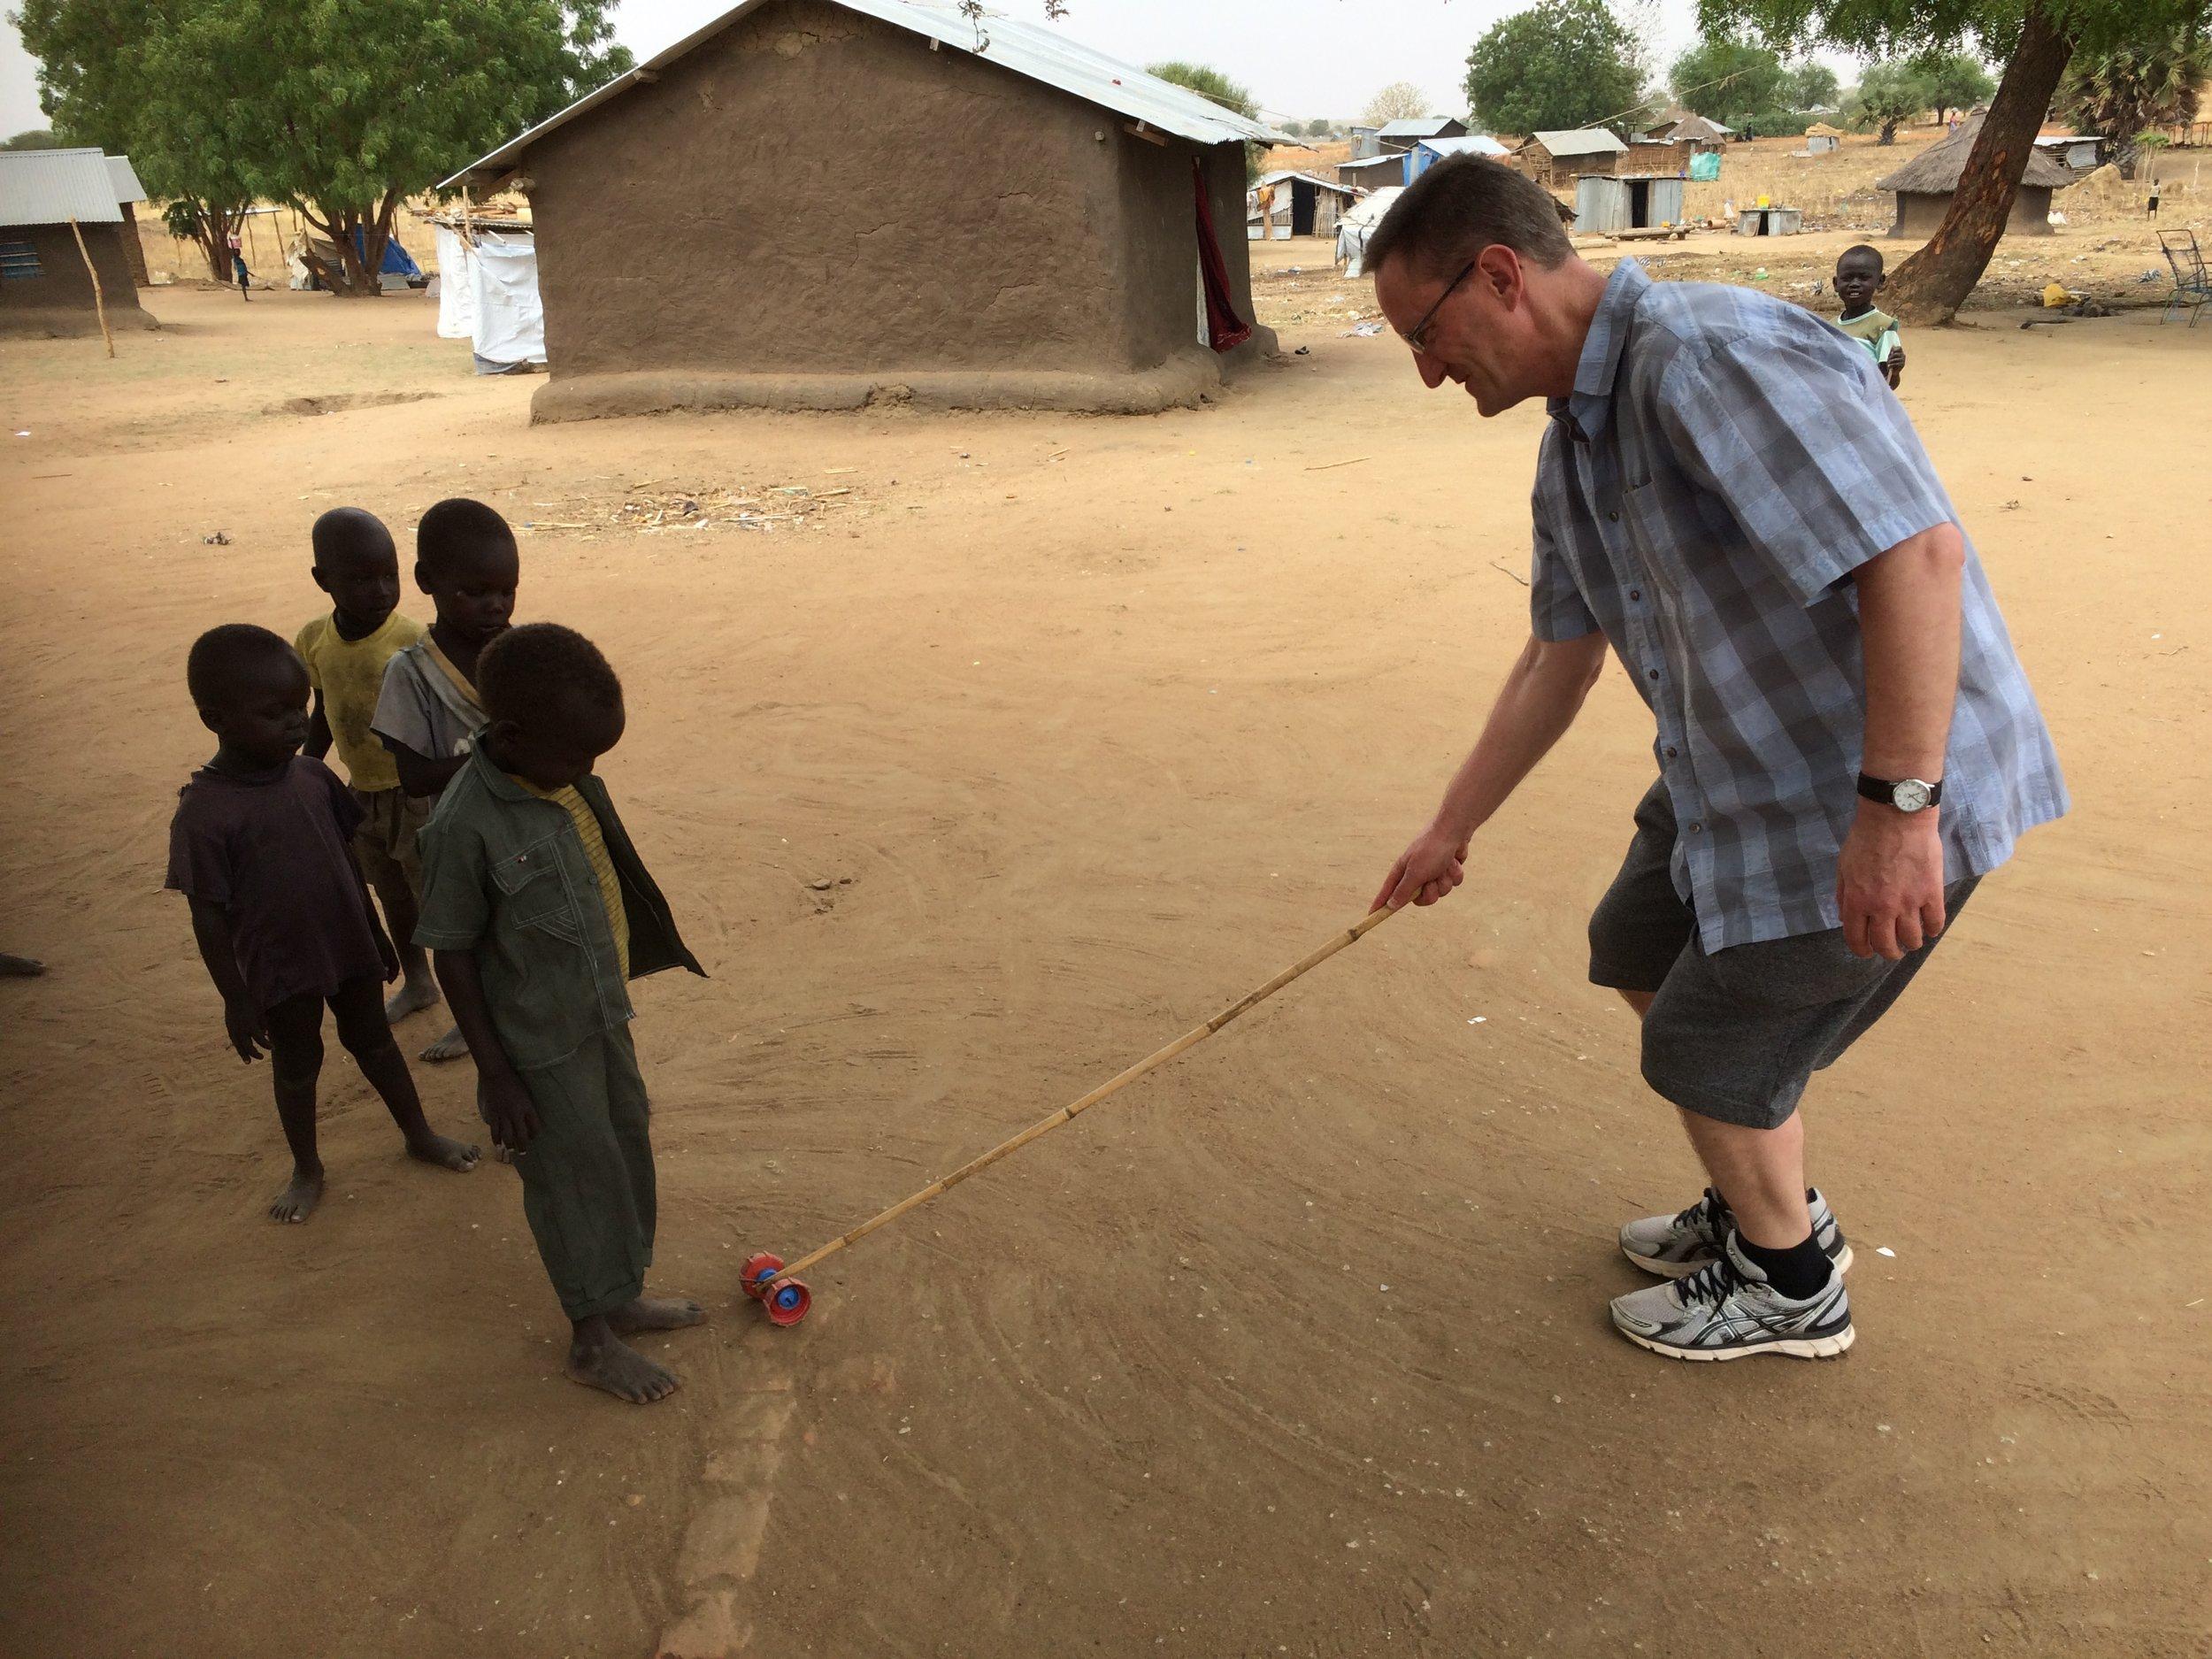 Ted brockmann, Elder & local Outreach